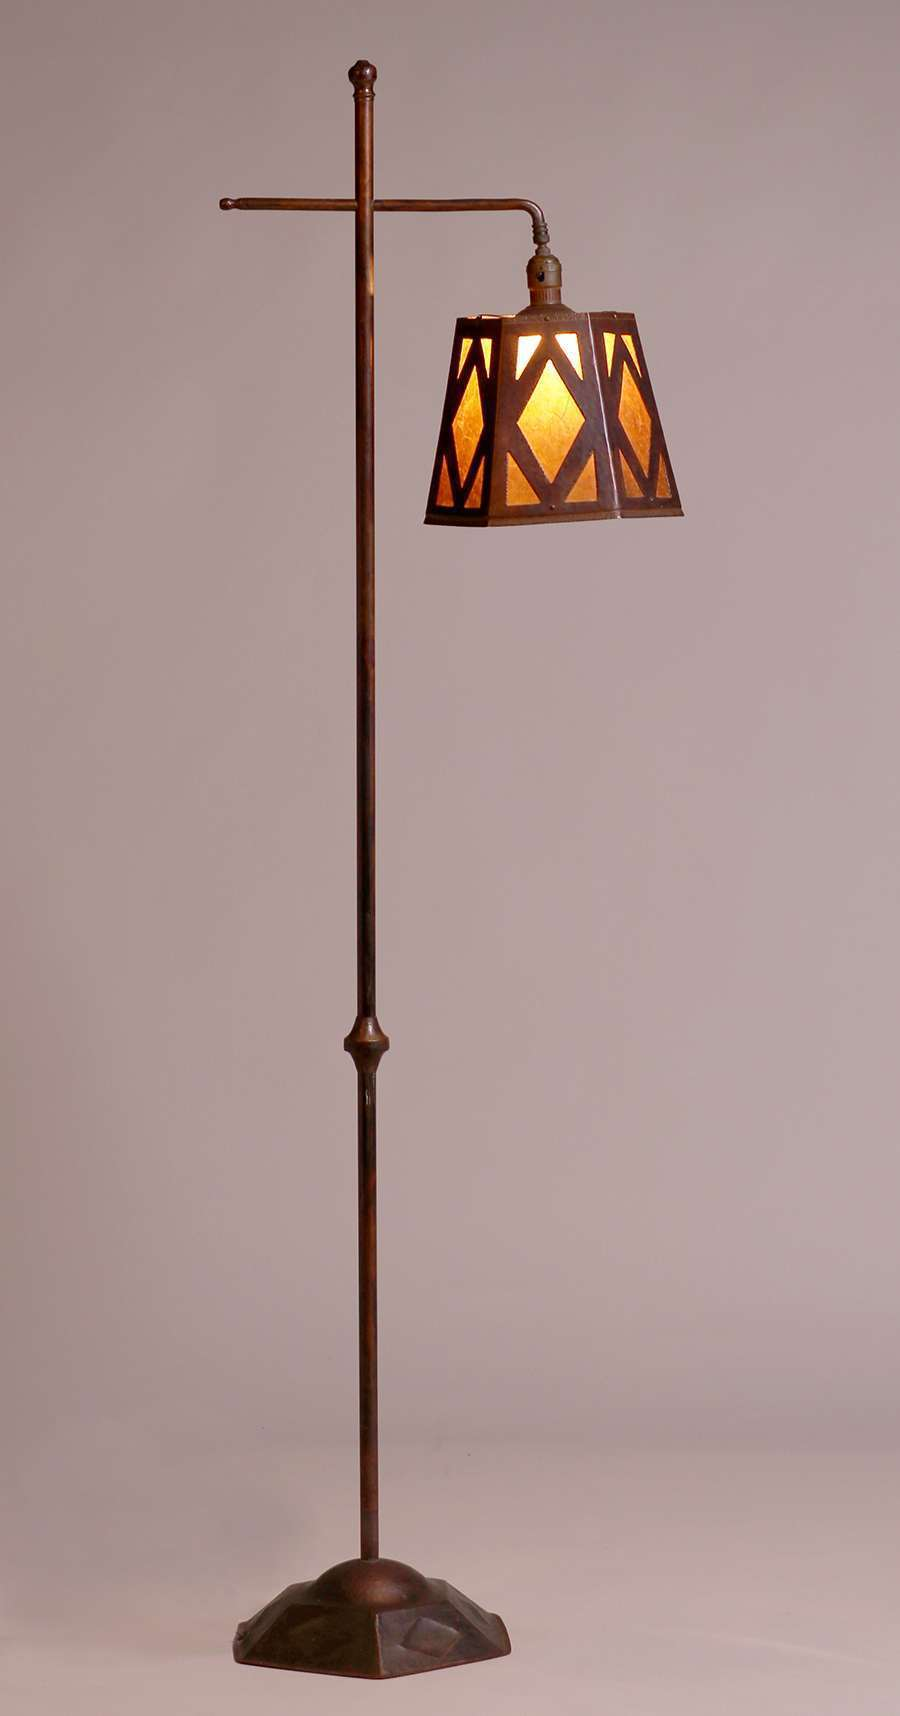 Armenac Hairenian Hammered Copper Amp Mica Floor Lamp C1930 California Historical Design